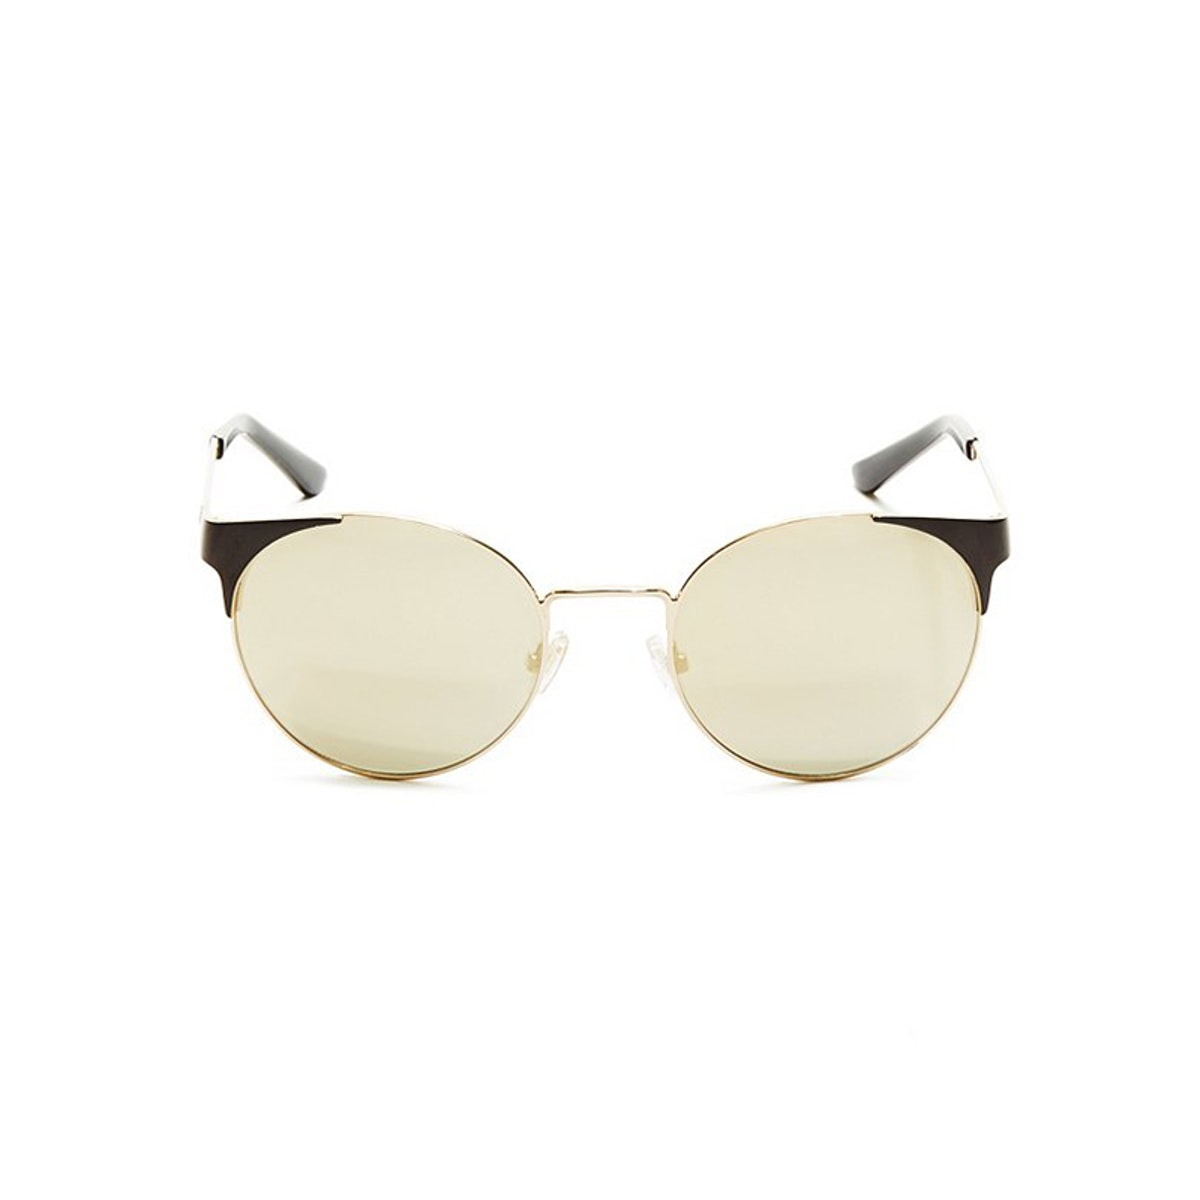 Lia Mirrored Round Sunglasses